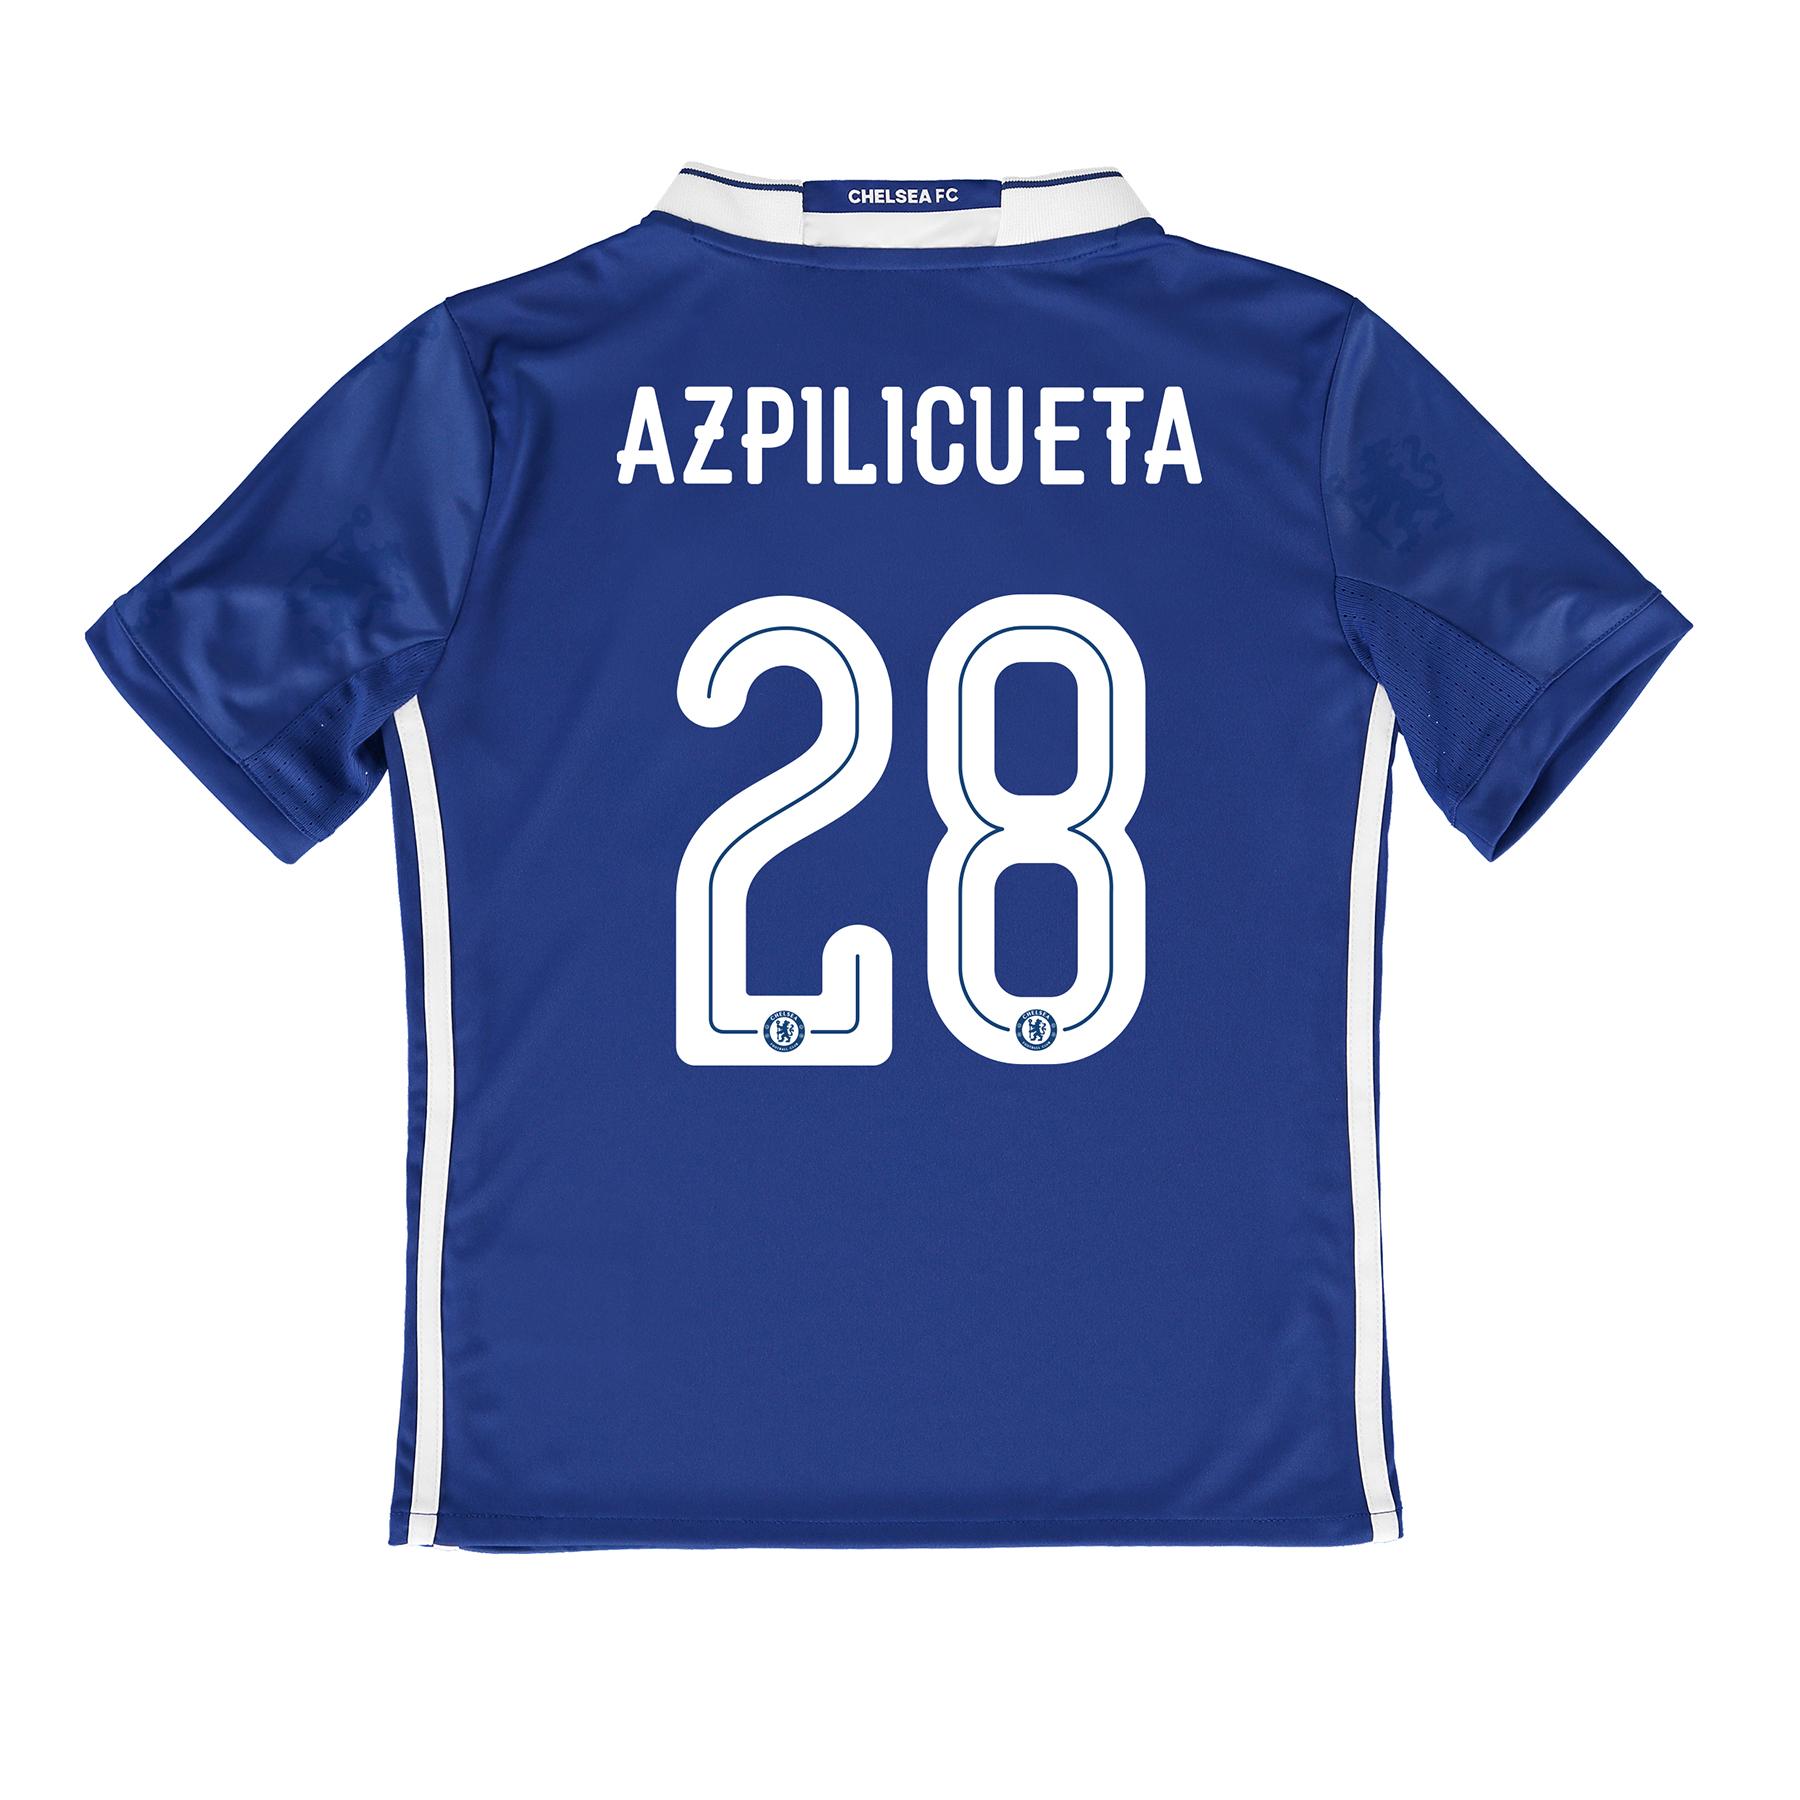 Chelsea Linear Home Shirt 2016-17 - Kids with Azpilicueta 28 printing